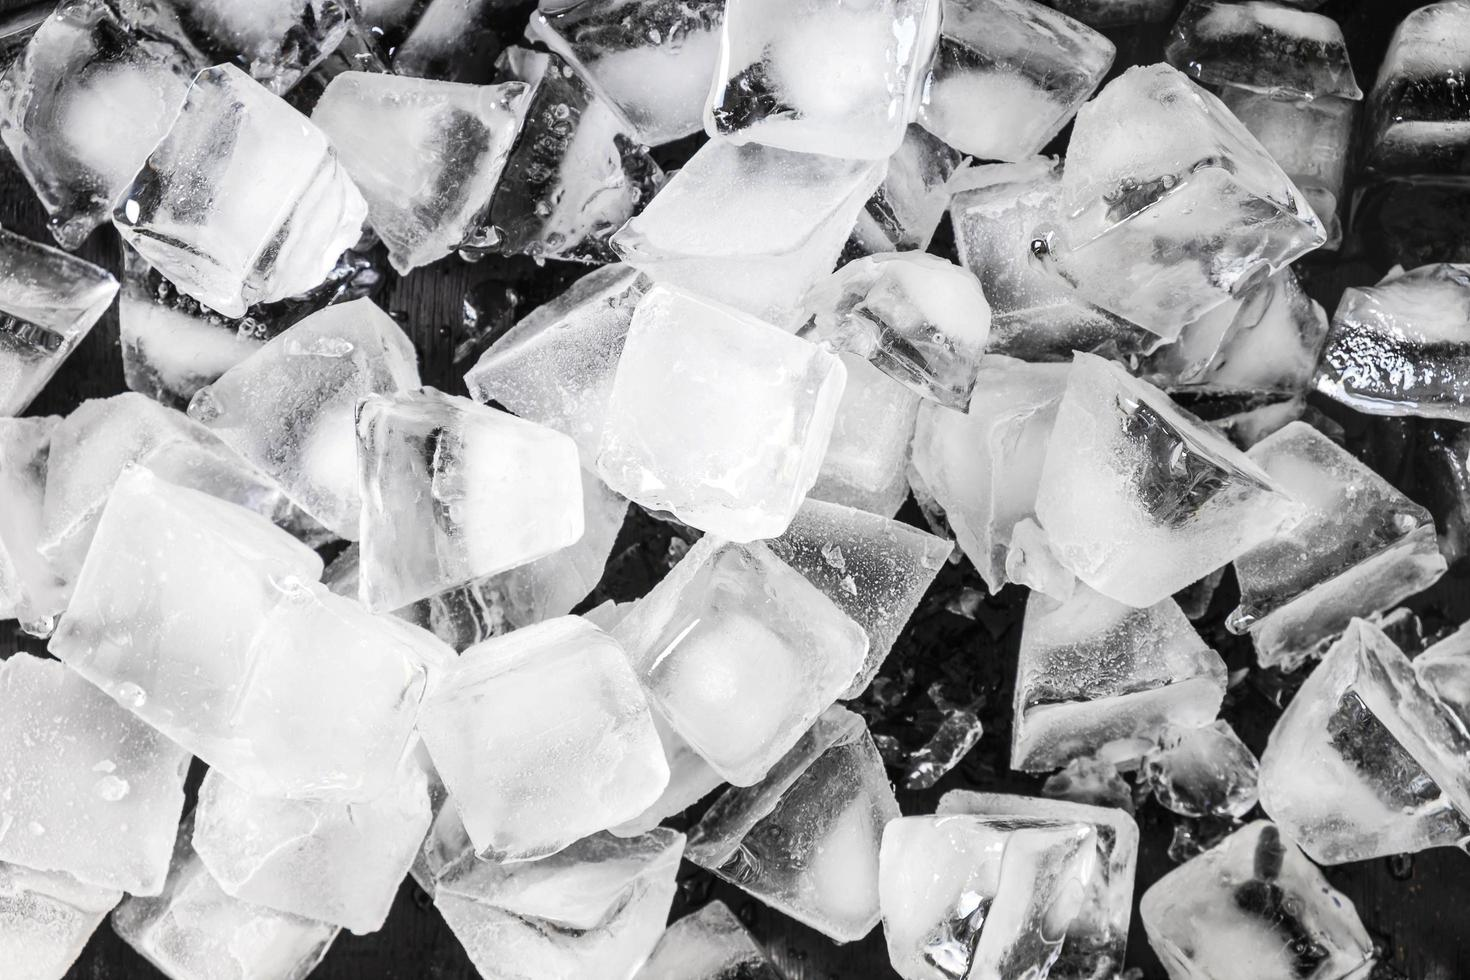 cubitos de hielo sobre fondo negro foto